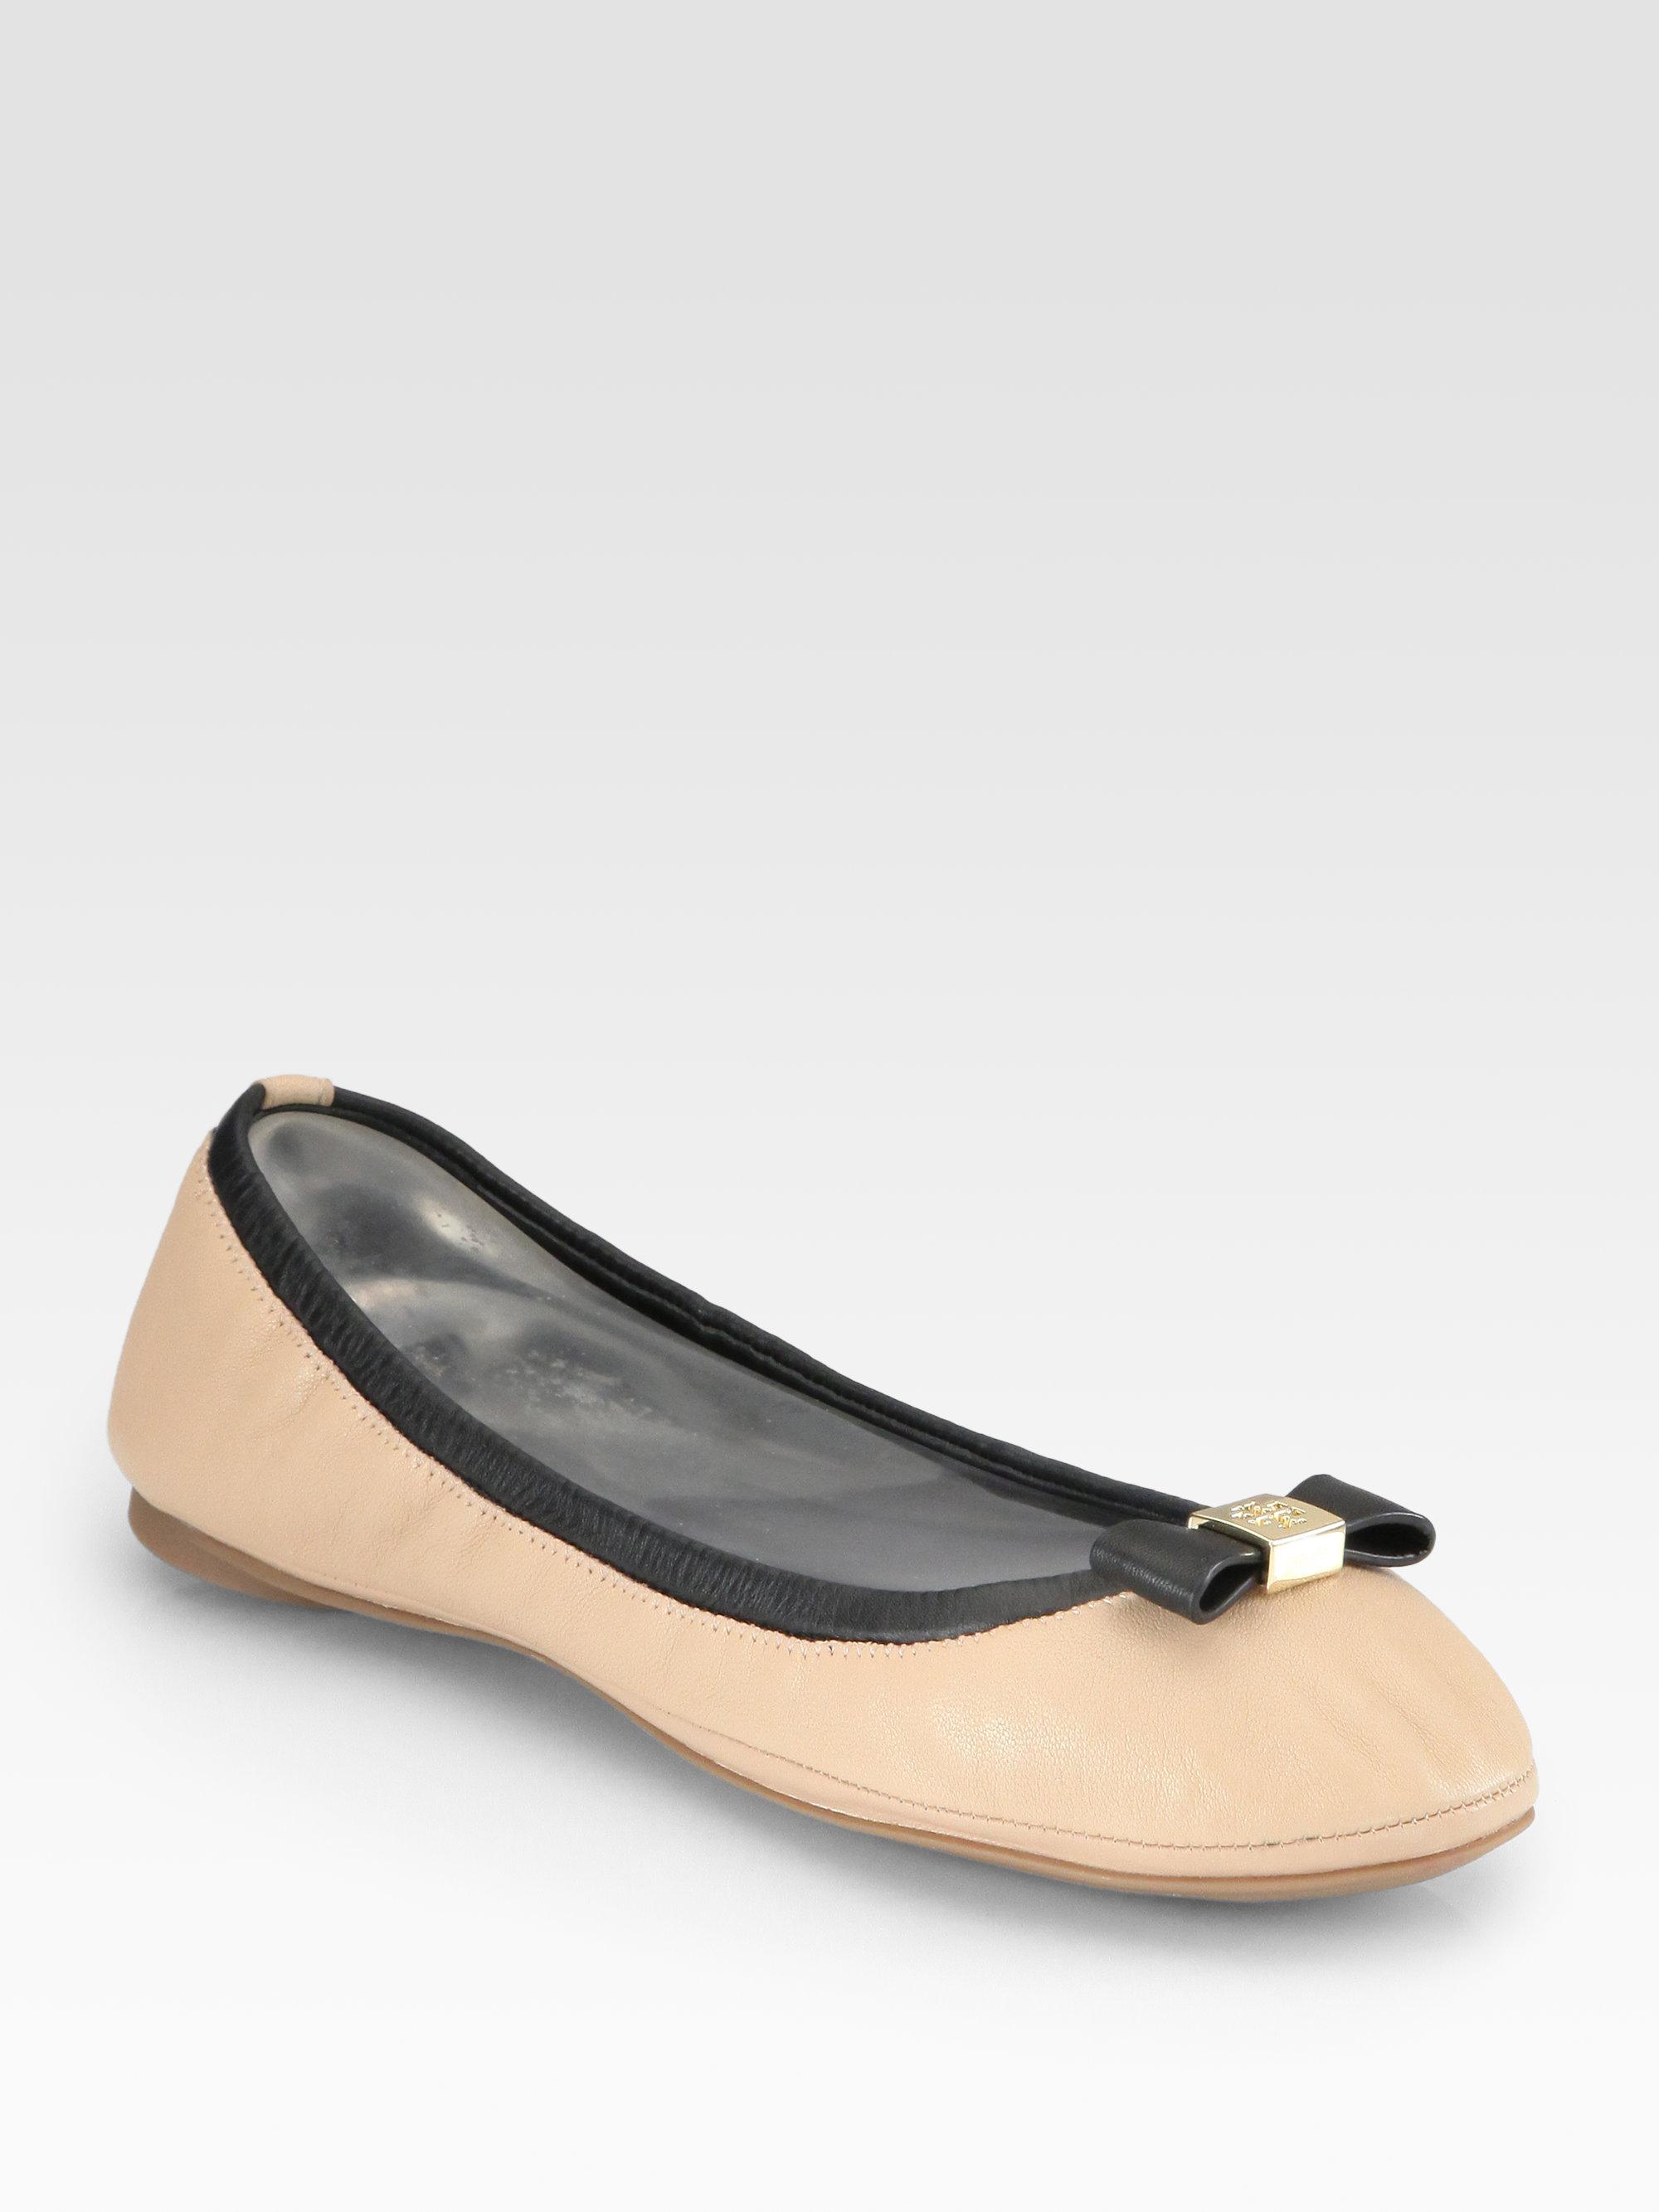 Salvatore Ferragamo Womens Sport Shoes